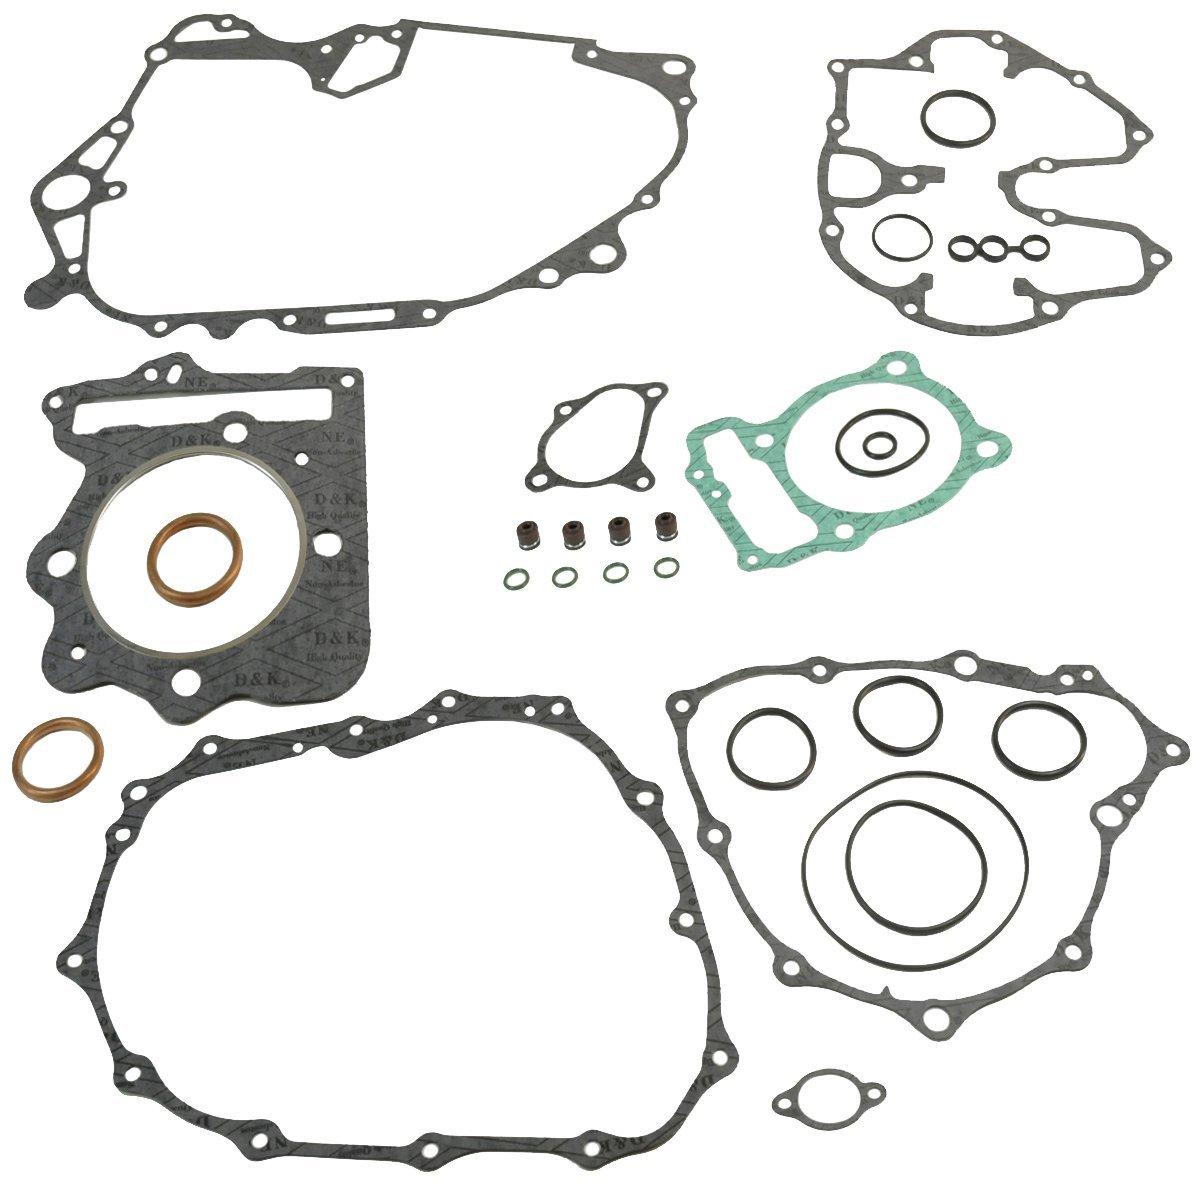 Buy Niche Industries 1611 Honda Sportrax TRX400EX Cylinder